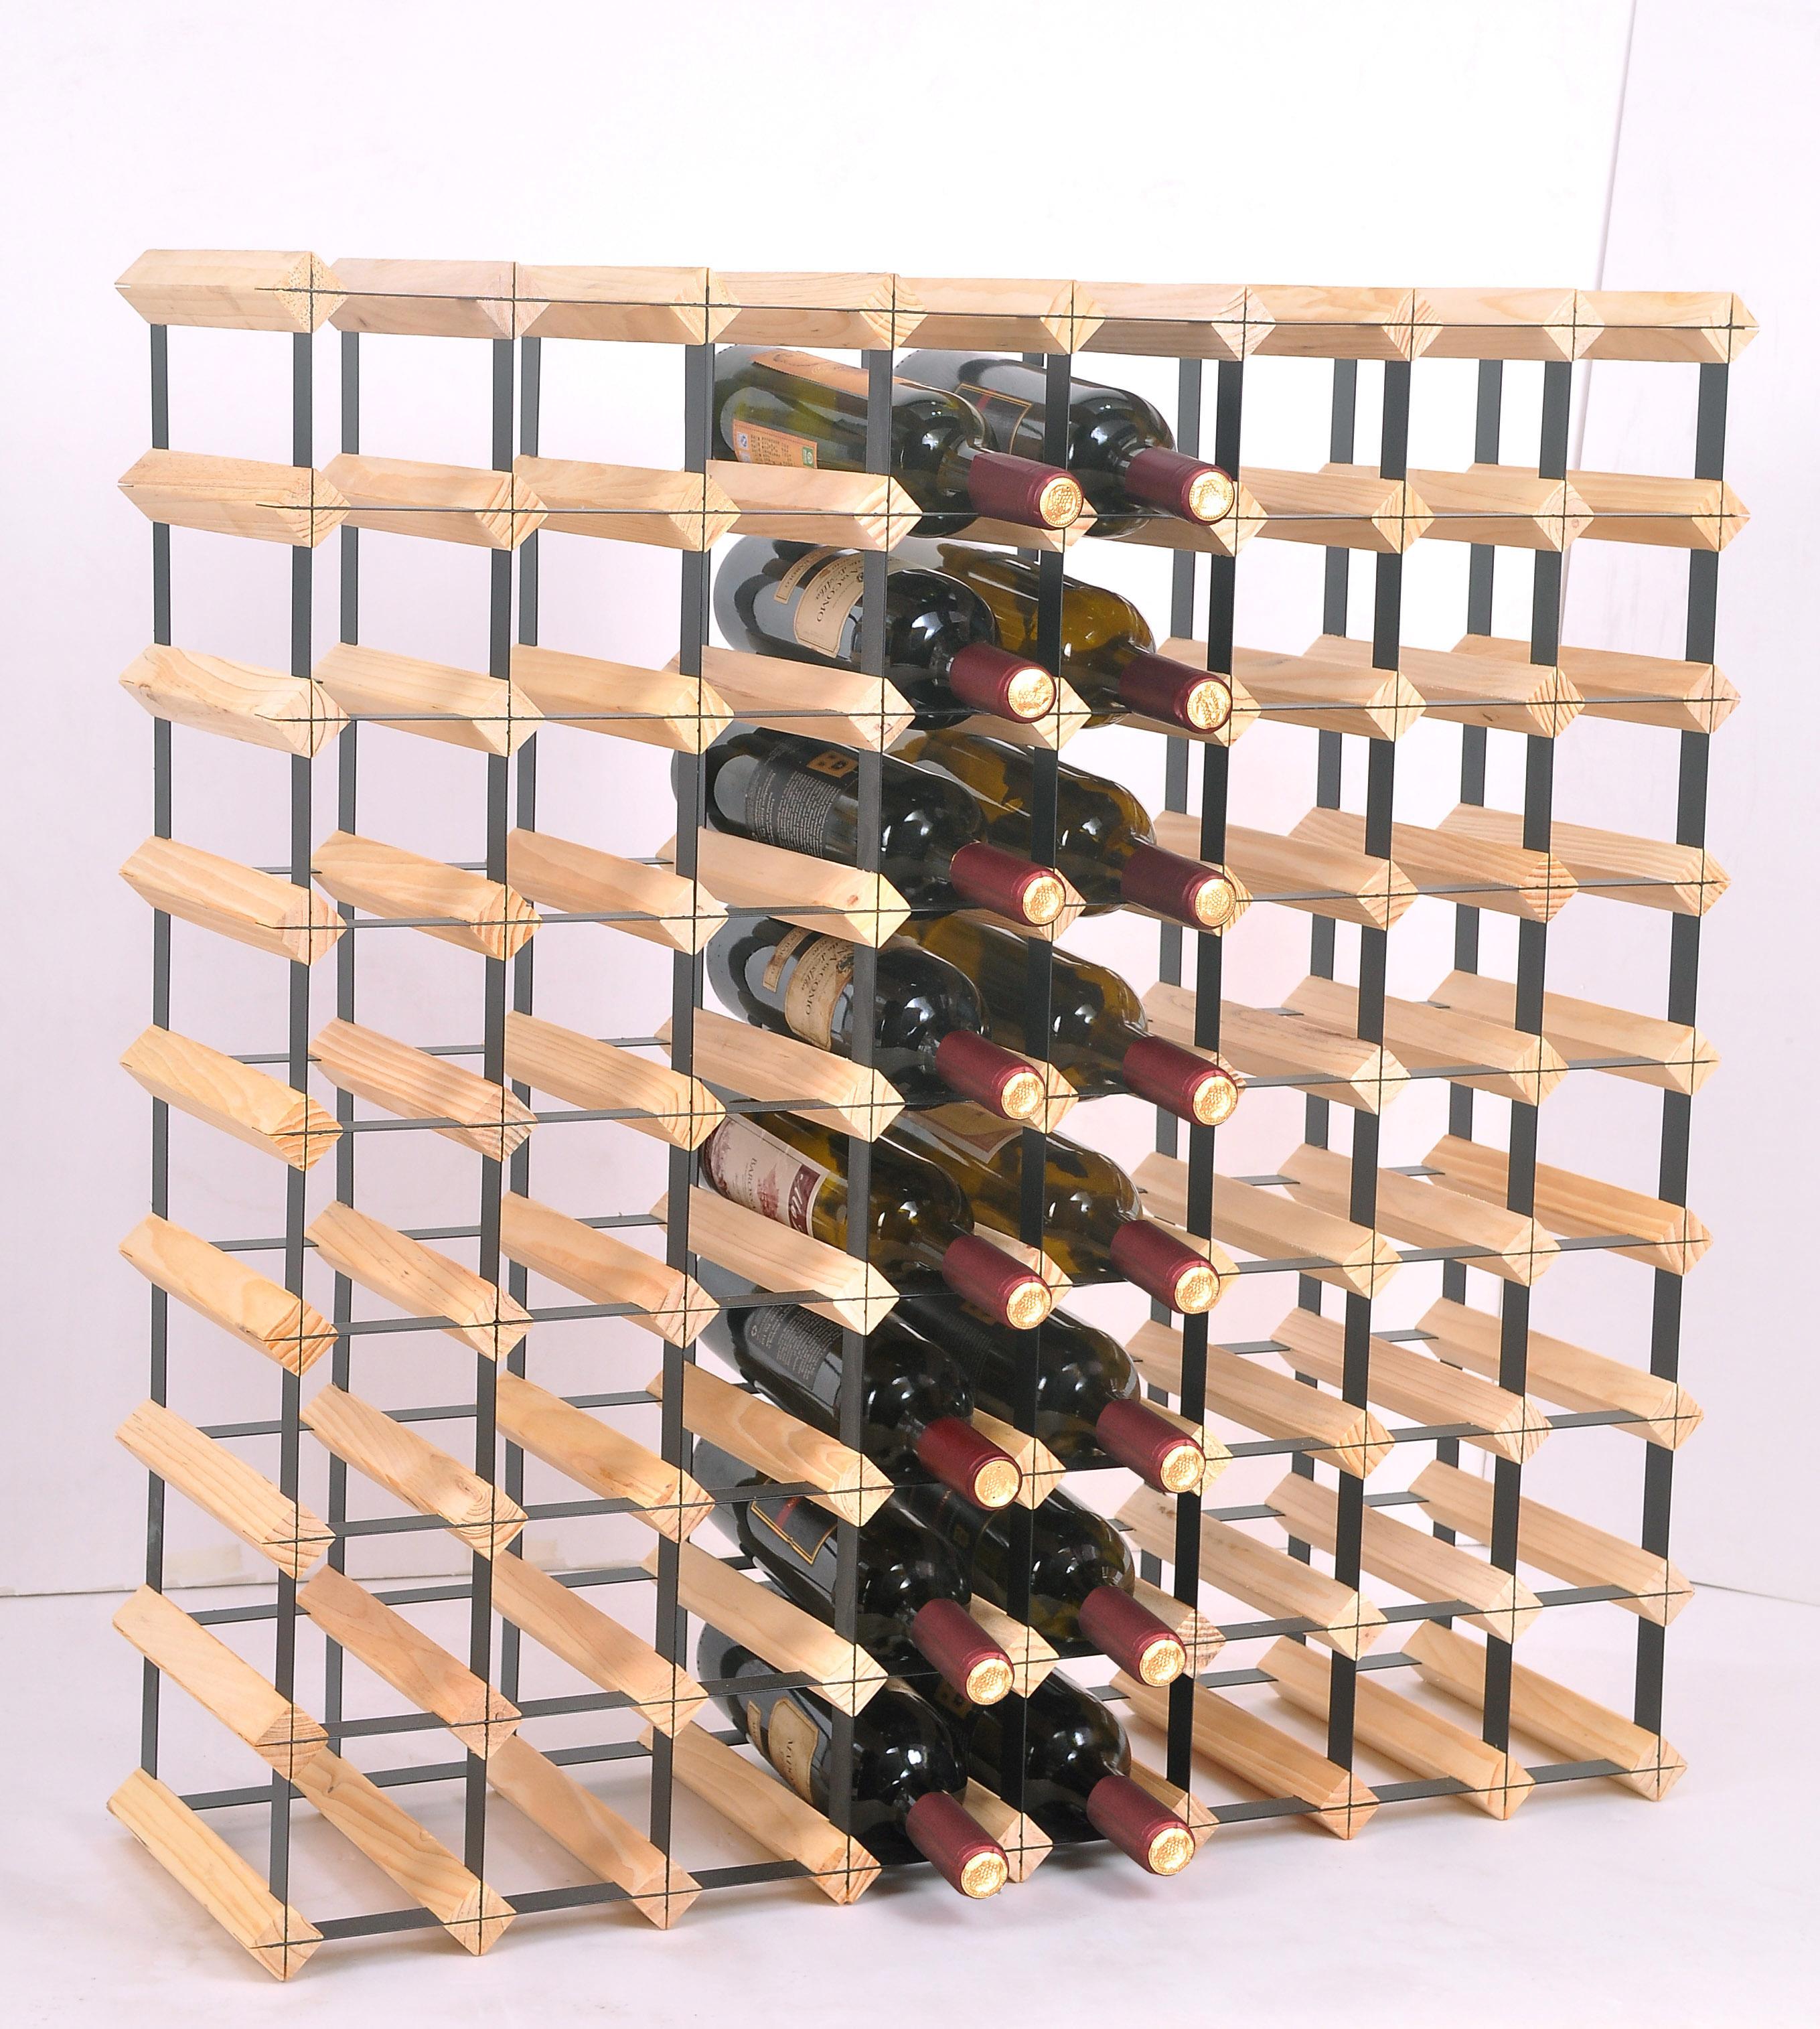 72 Bottle Timber Wine Rack - Complete Wooden Wine Storage System  Z2707